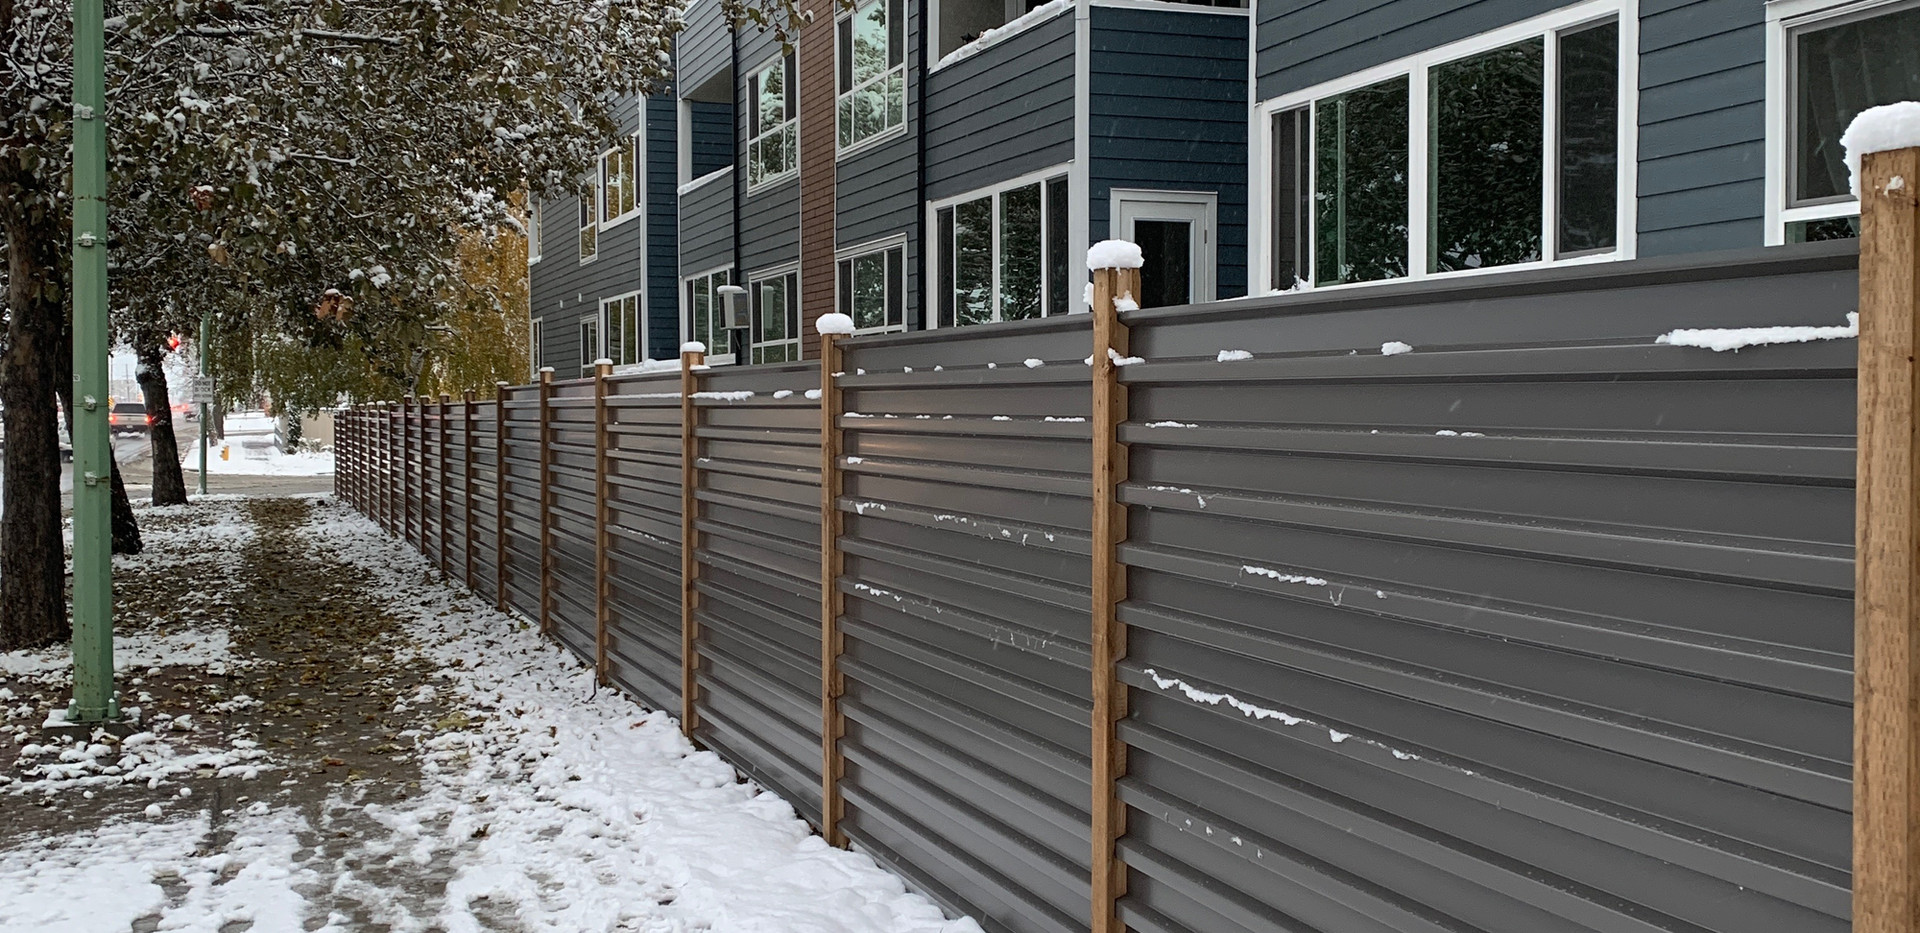 Charcoal grey corrugated